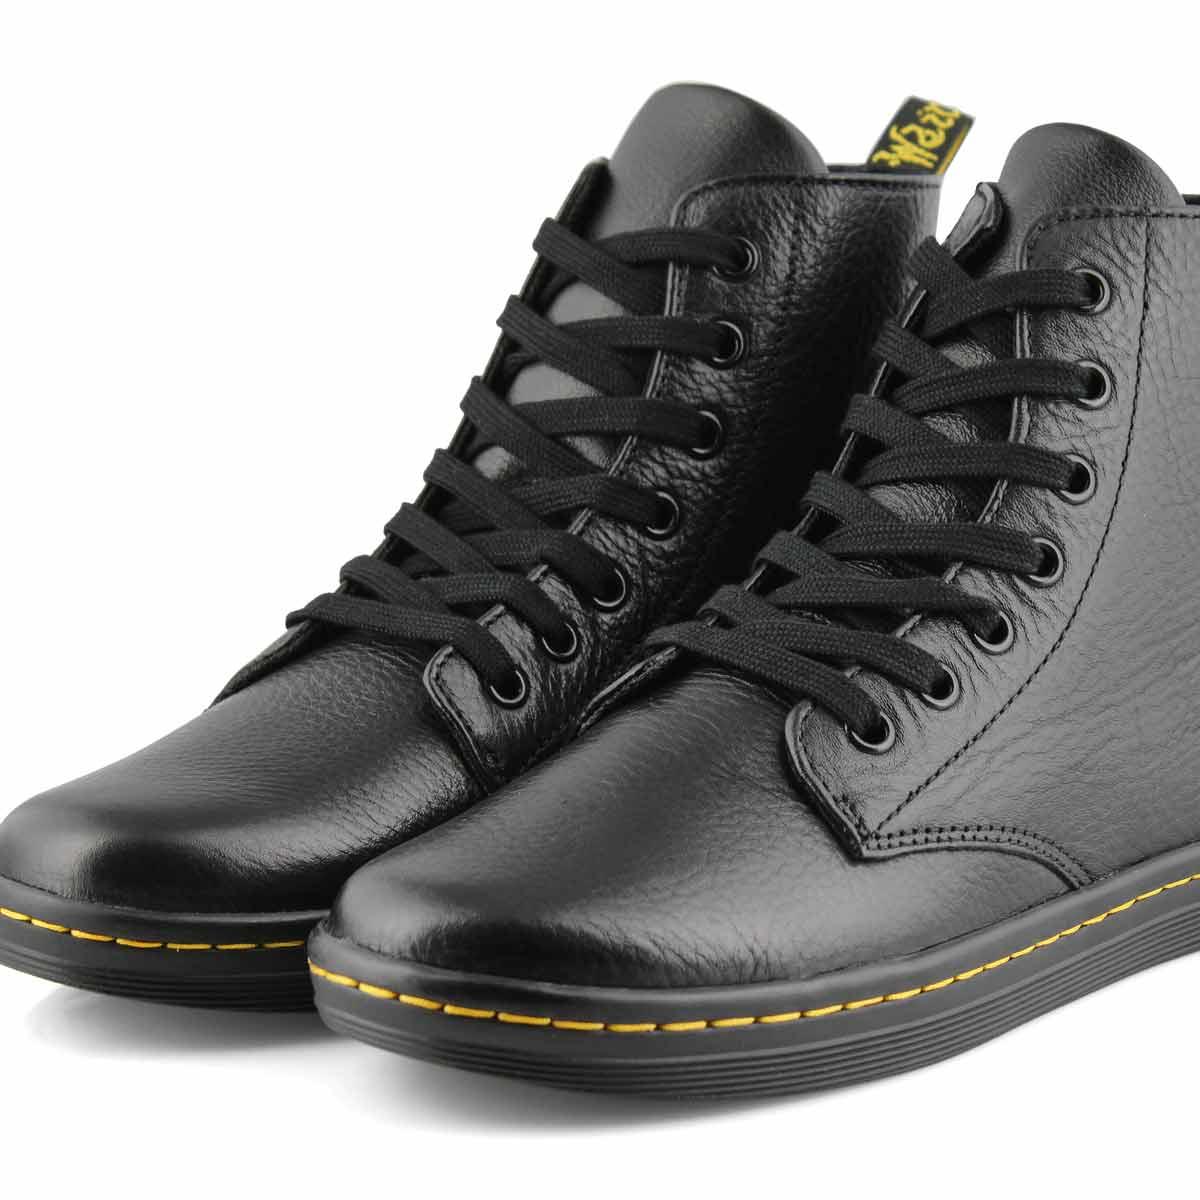 Women's Leyton Ankle Bootie - Black